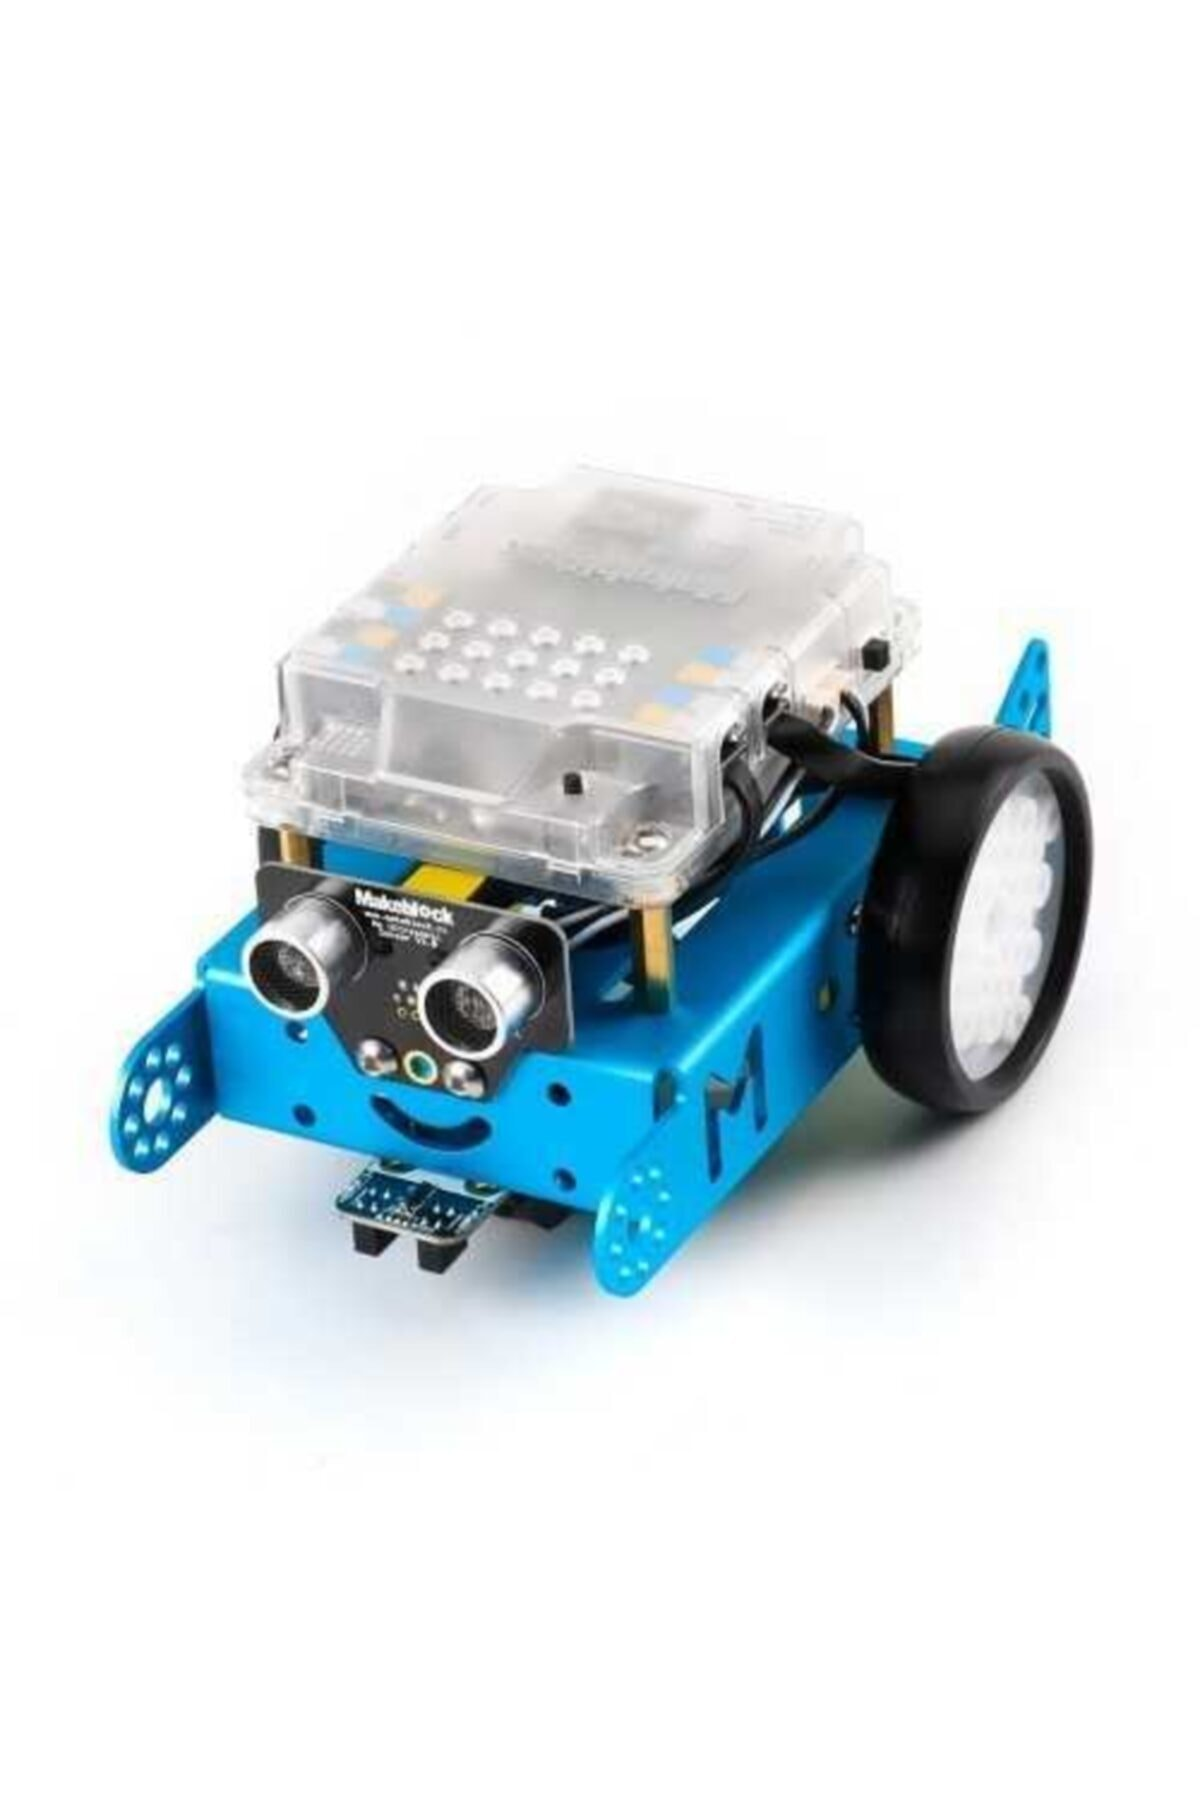 Robotistan Kitaplı Mbot Seti - 2.4 Ghz 2